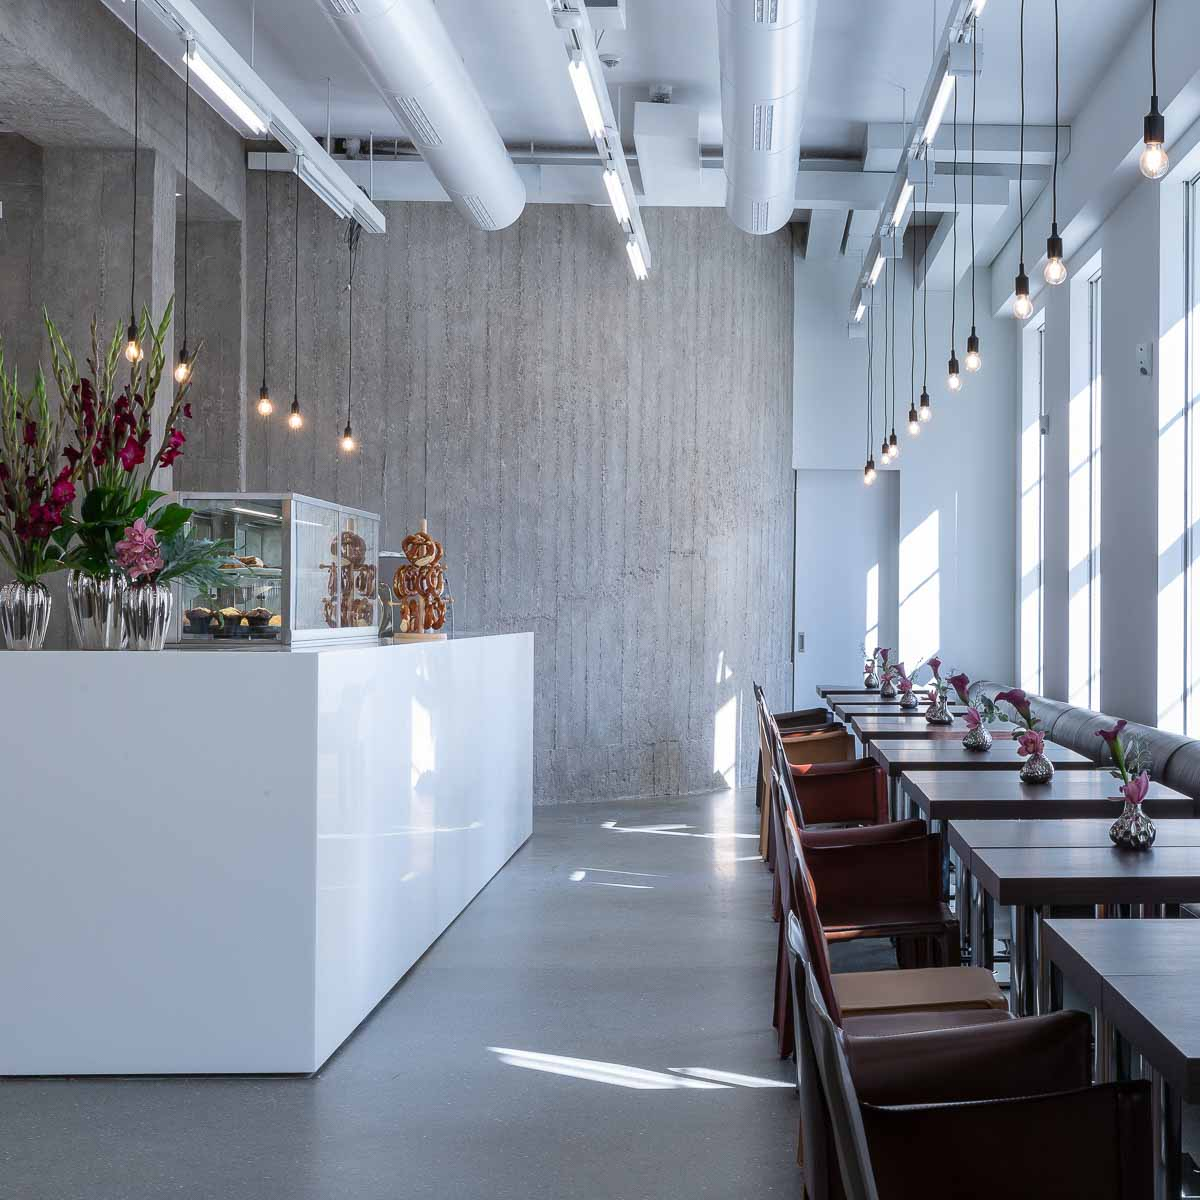 Palais Populaire Berlin Café © Andreas Bohlender